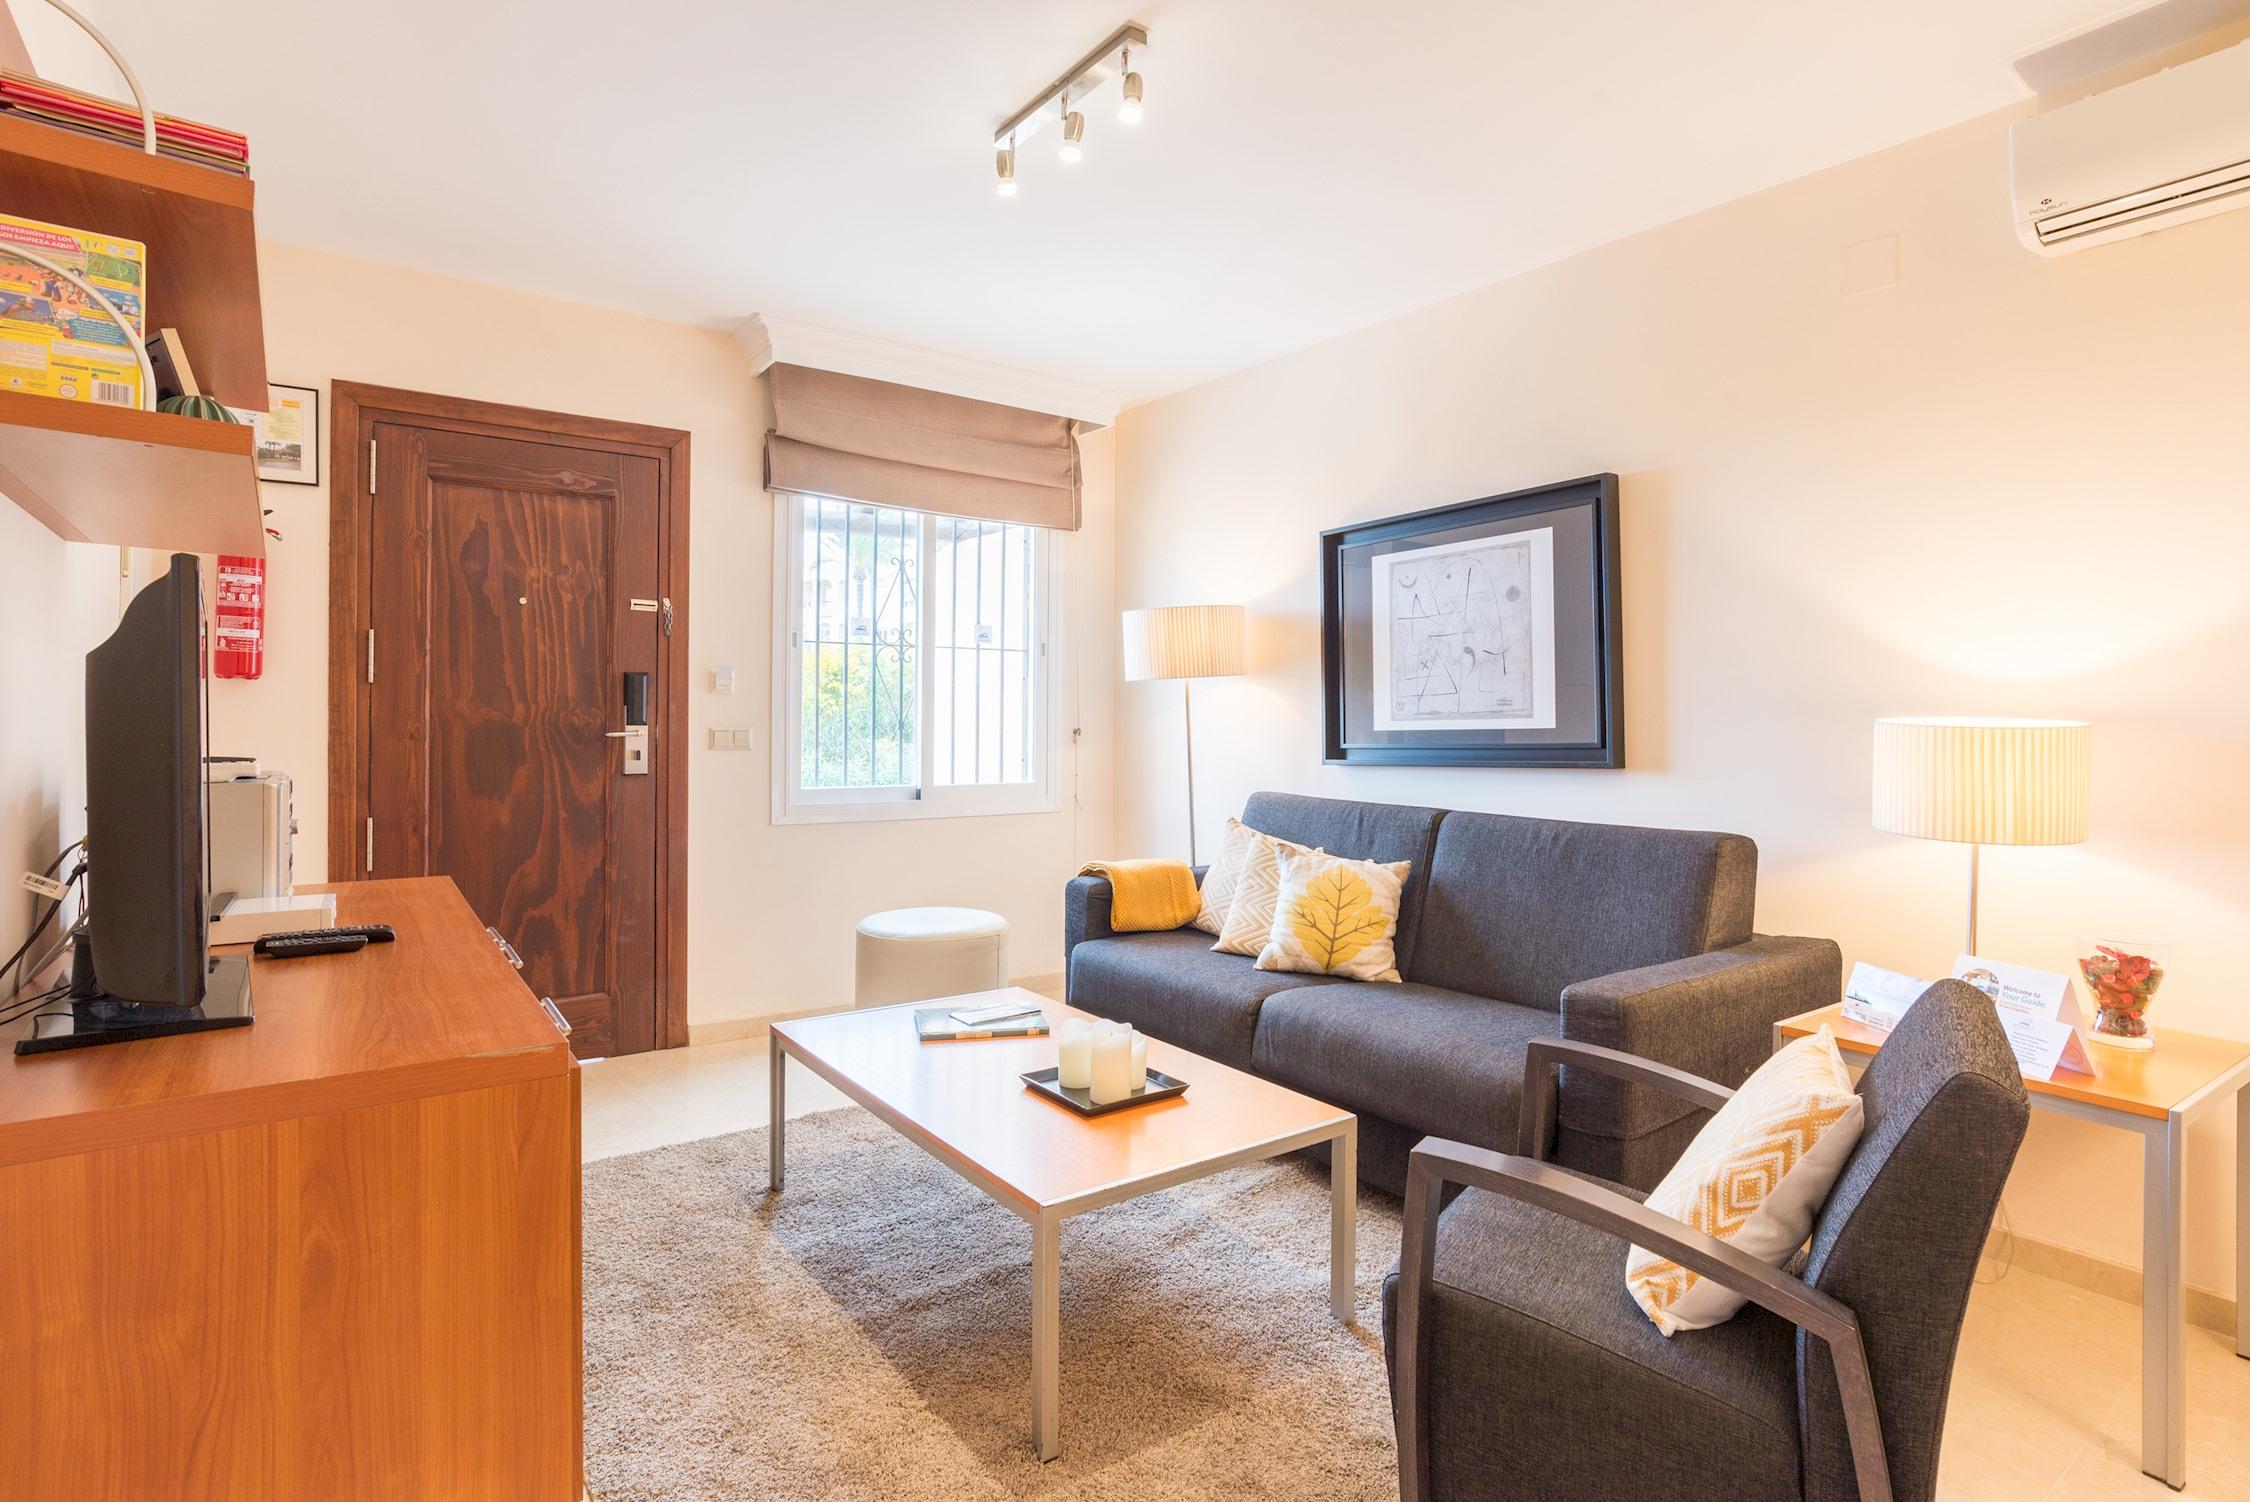 Apartment MalagaSuite Luxury   Relax photo 20518627